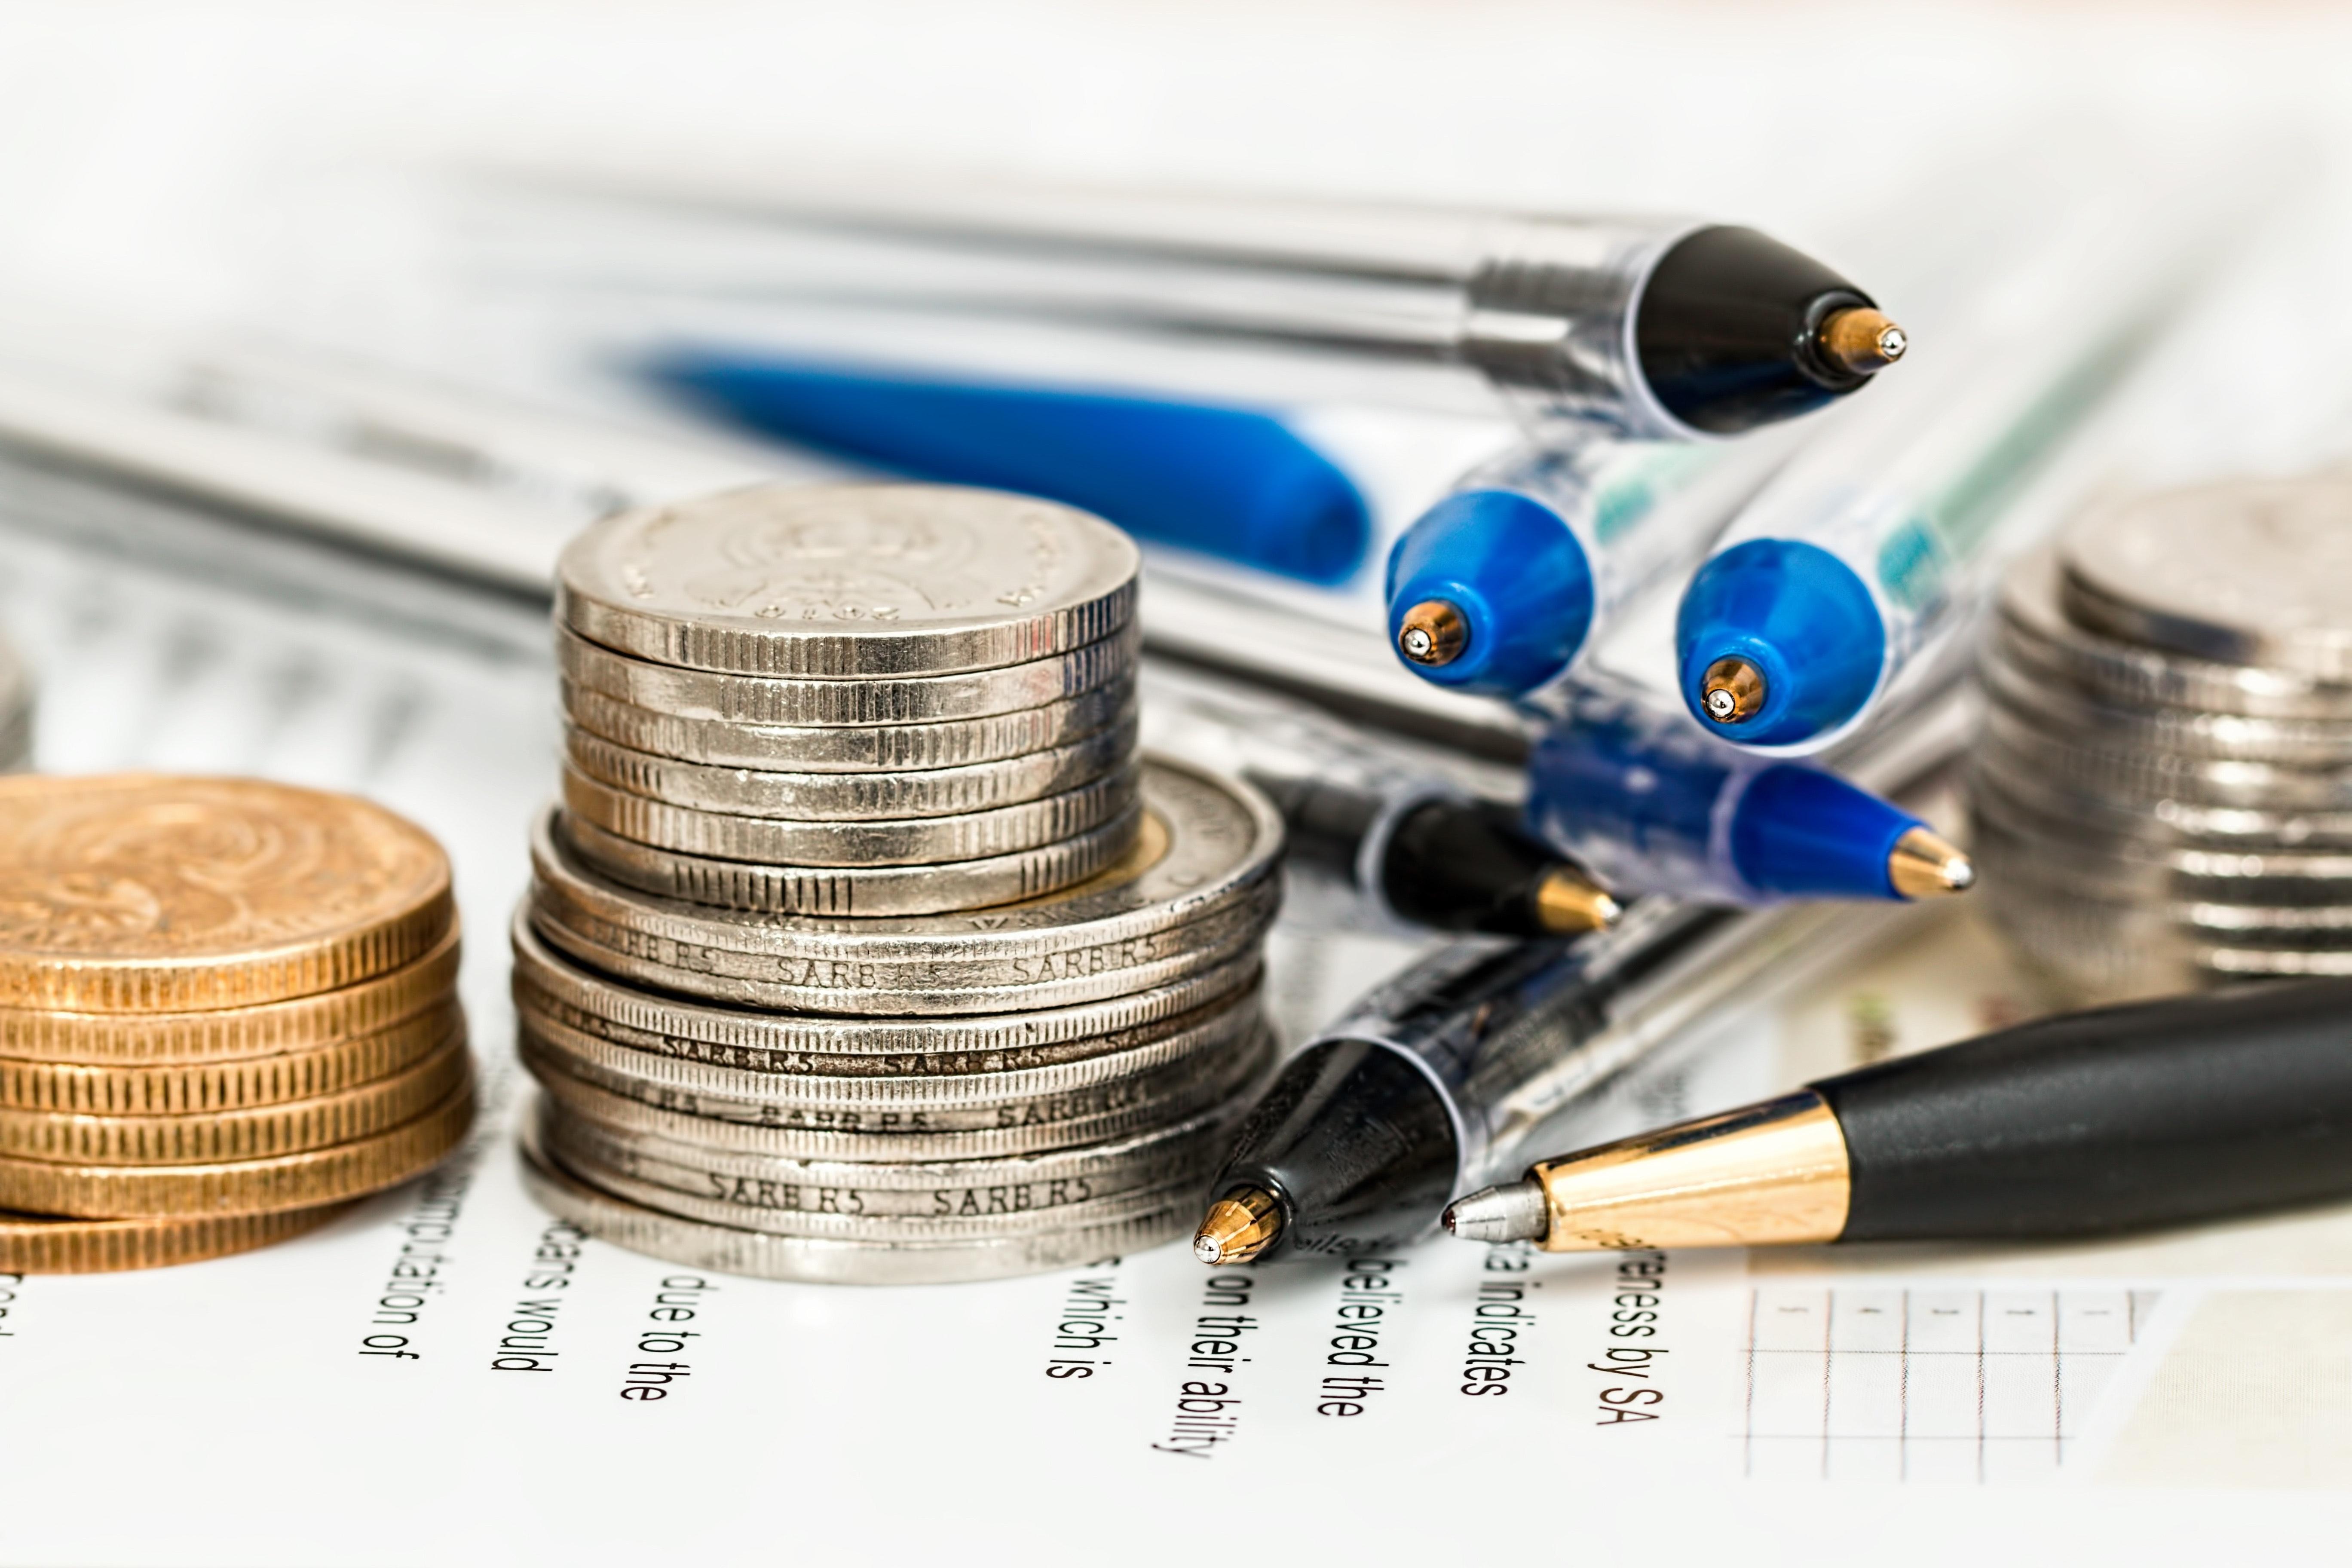 budget-cash-coins-33692